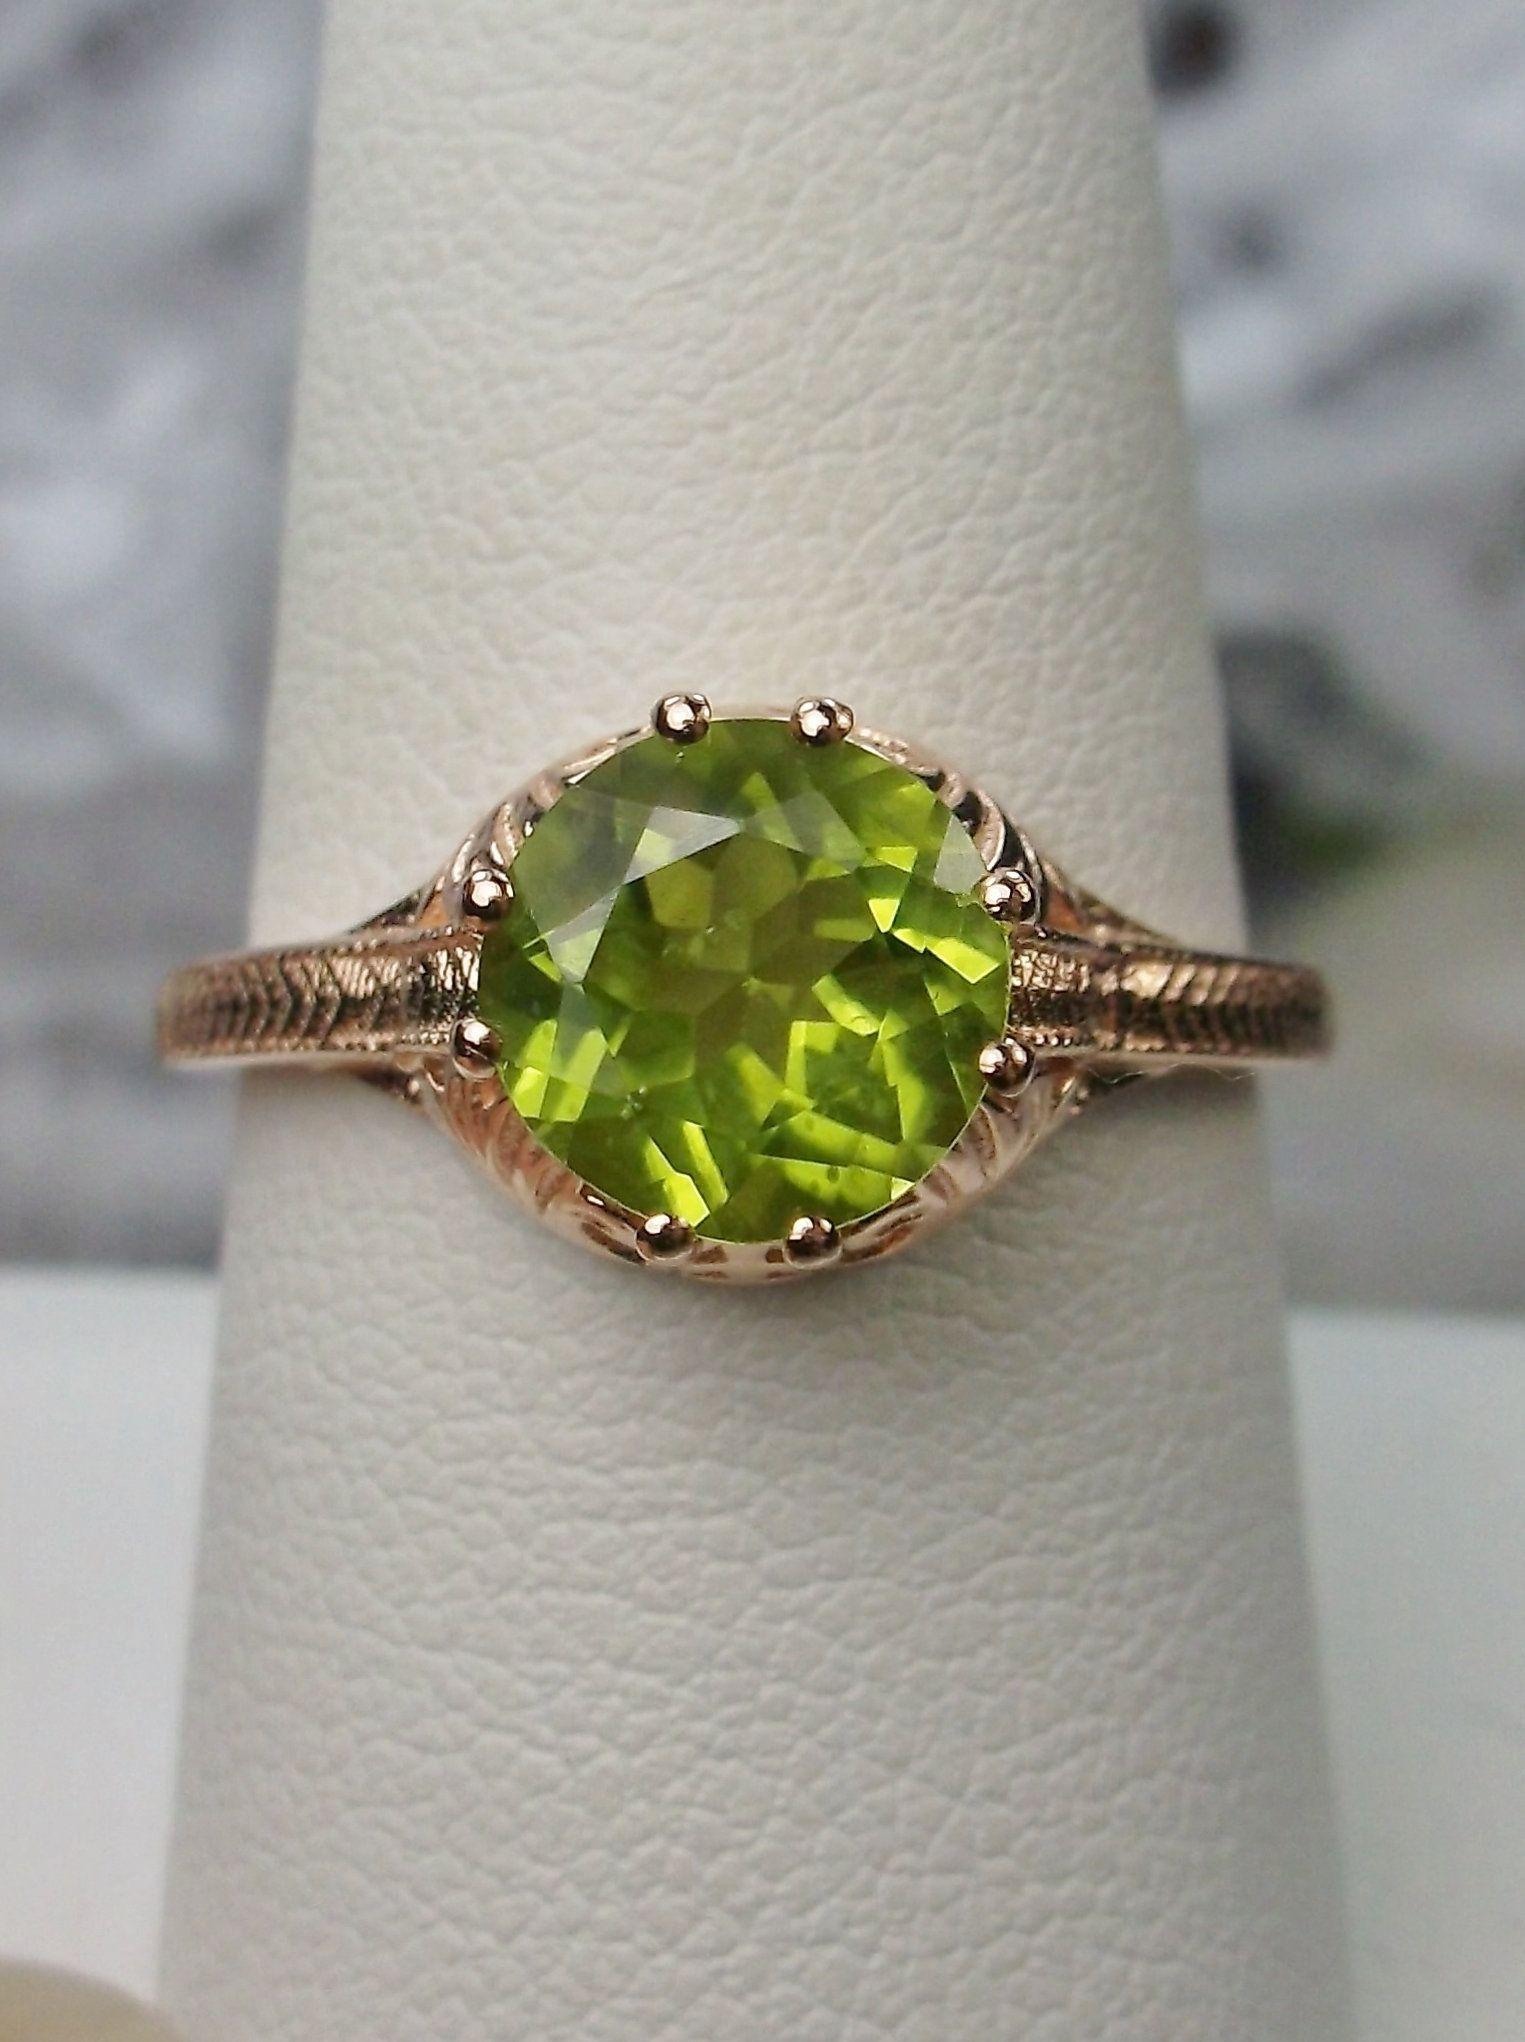 Victorian Natural Peridot 10k Rose Gold Victorian Filigree Ring Made To Order Design 158 Antique Filigree Jewelry Peridot Gemstone Peridot